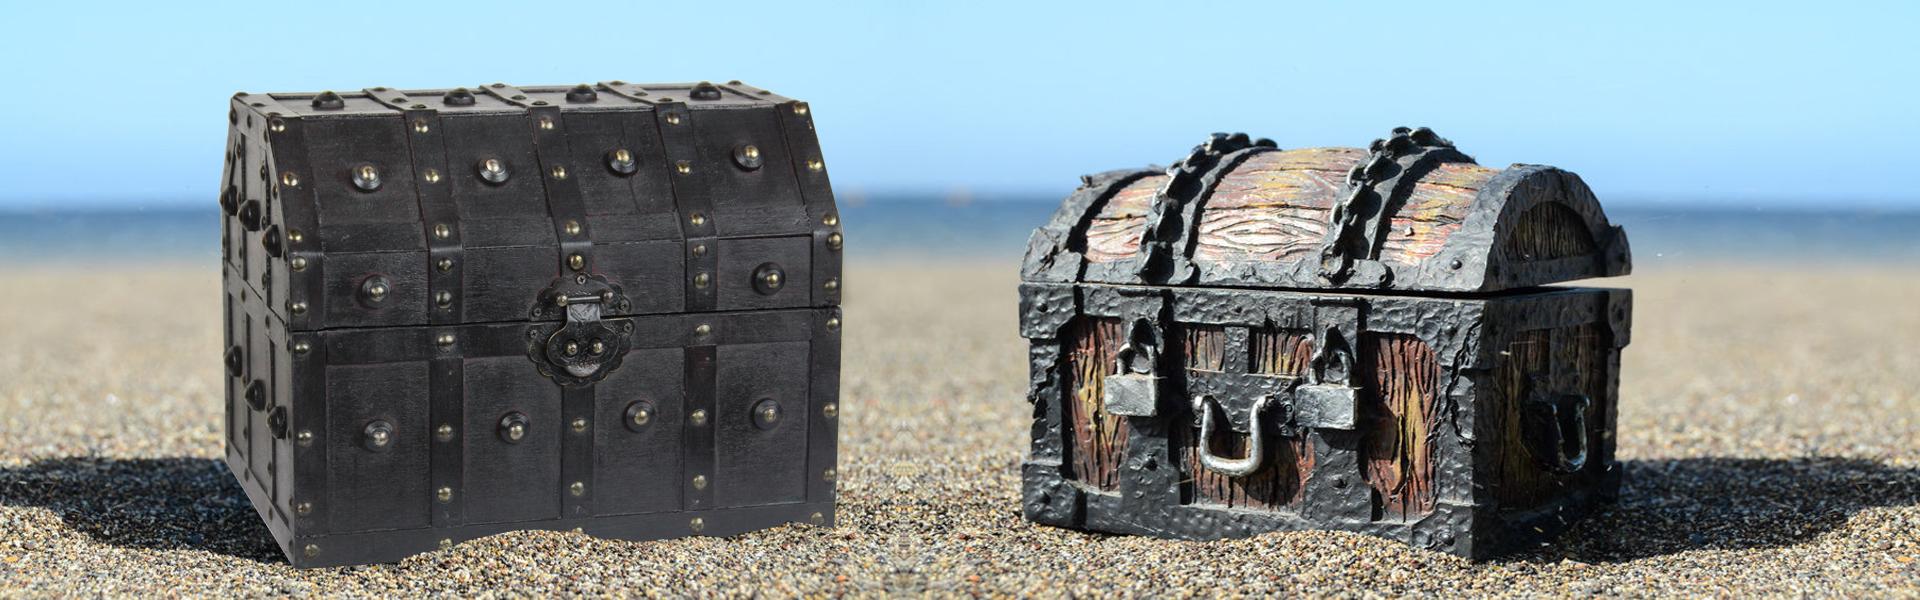 Pirate chest at beach